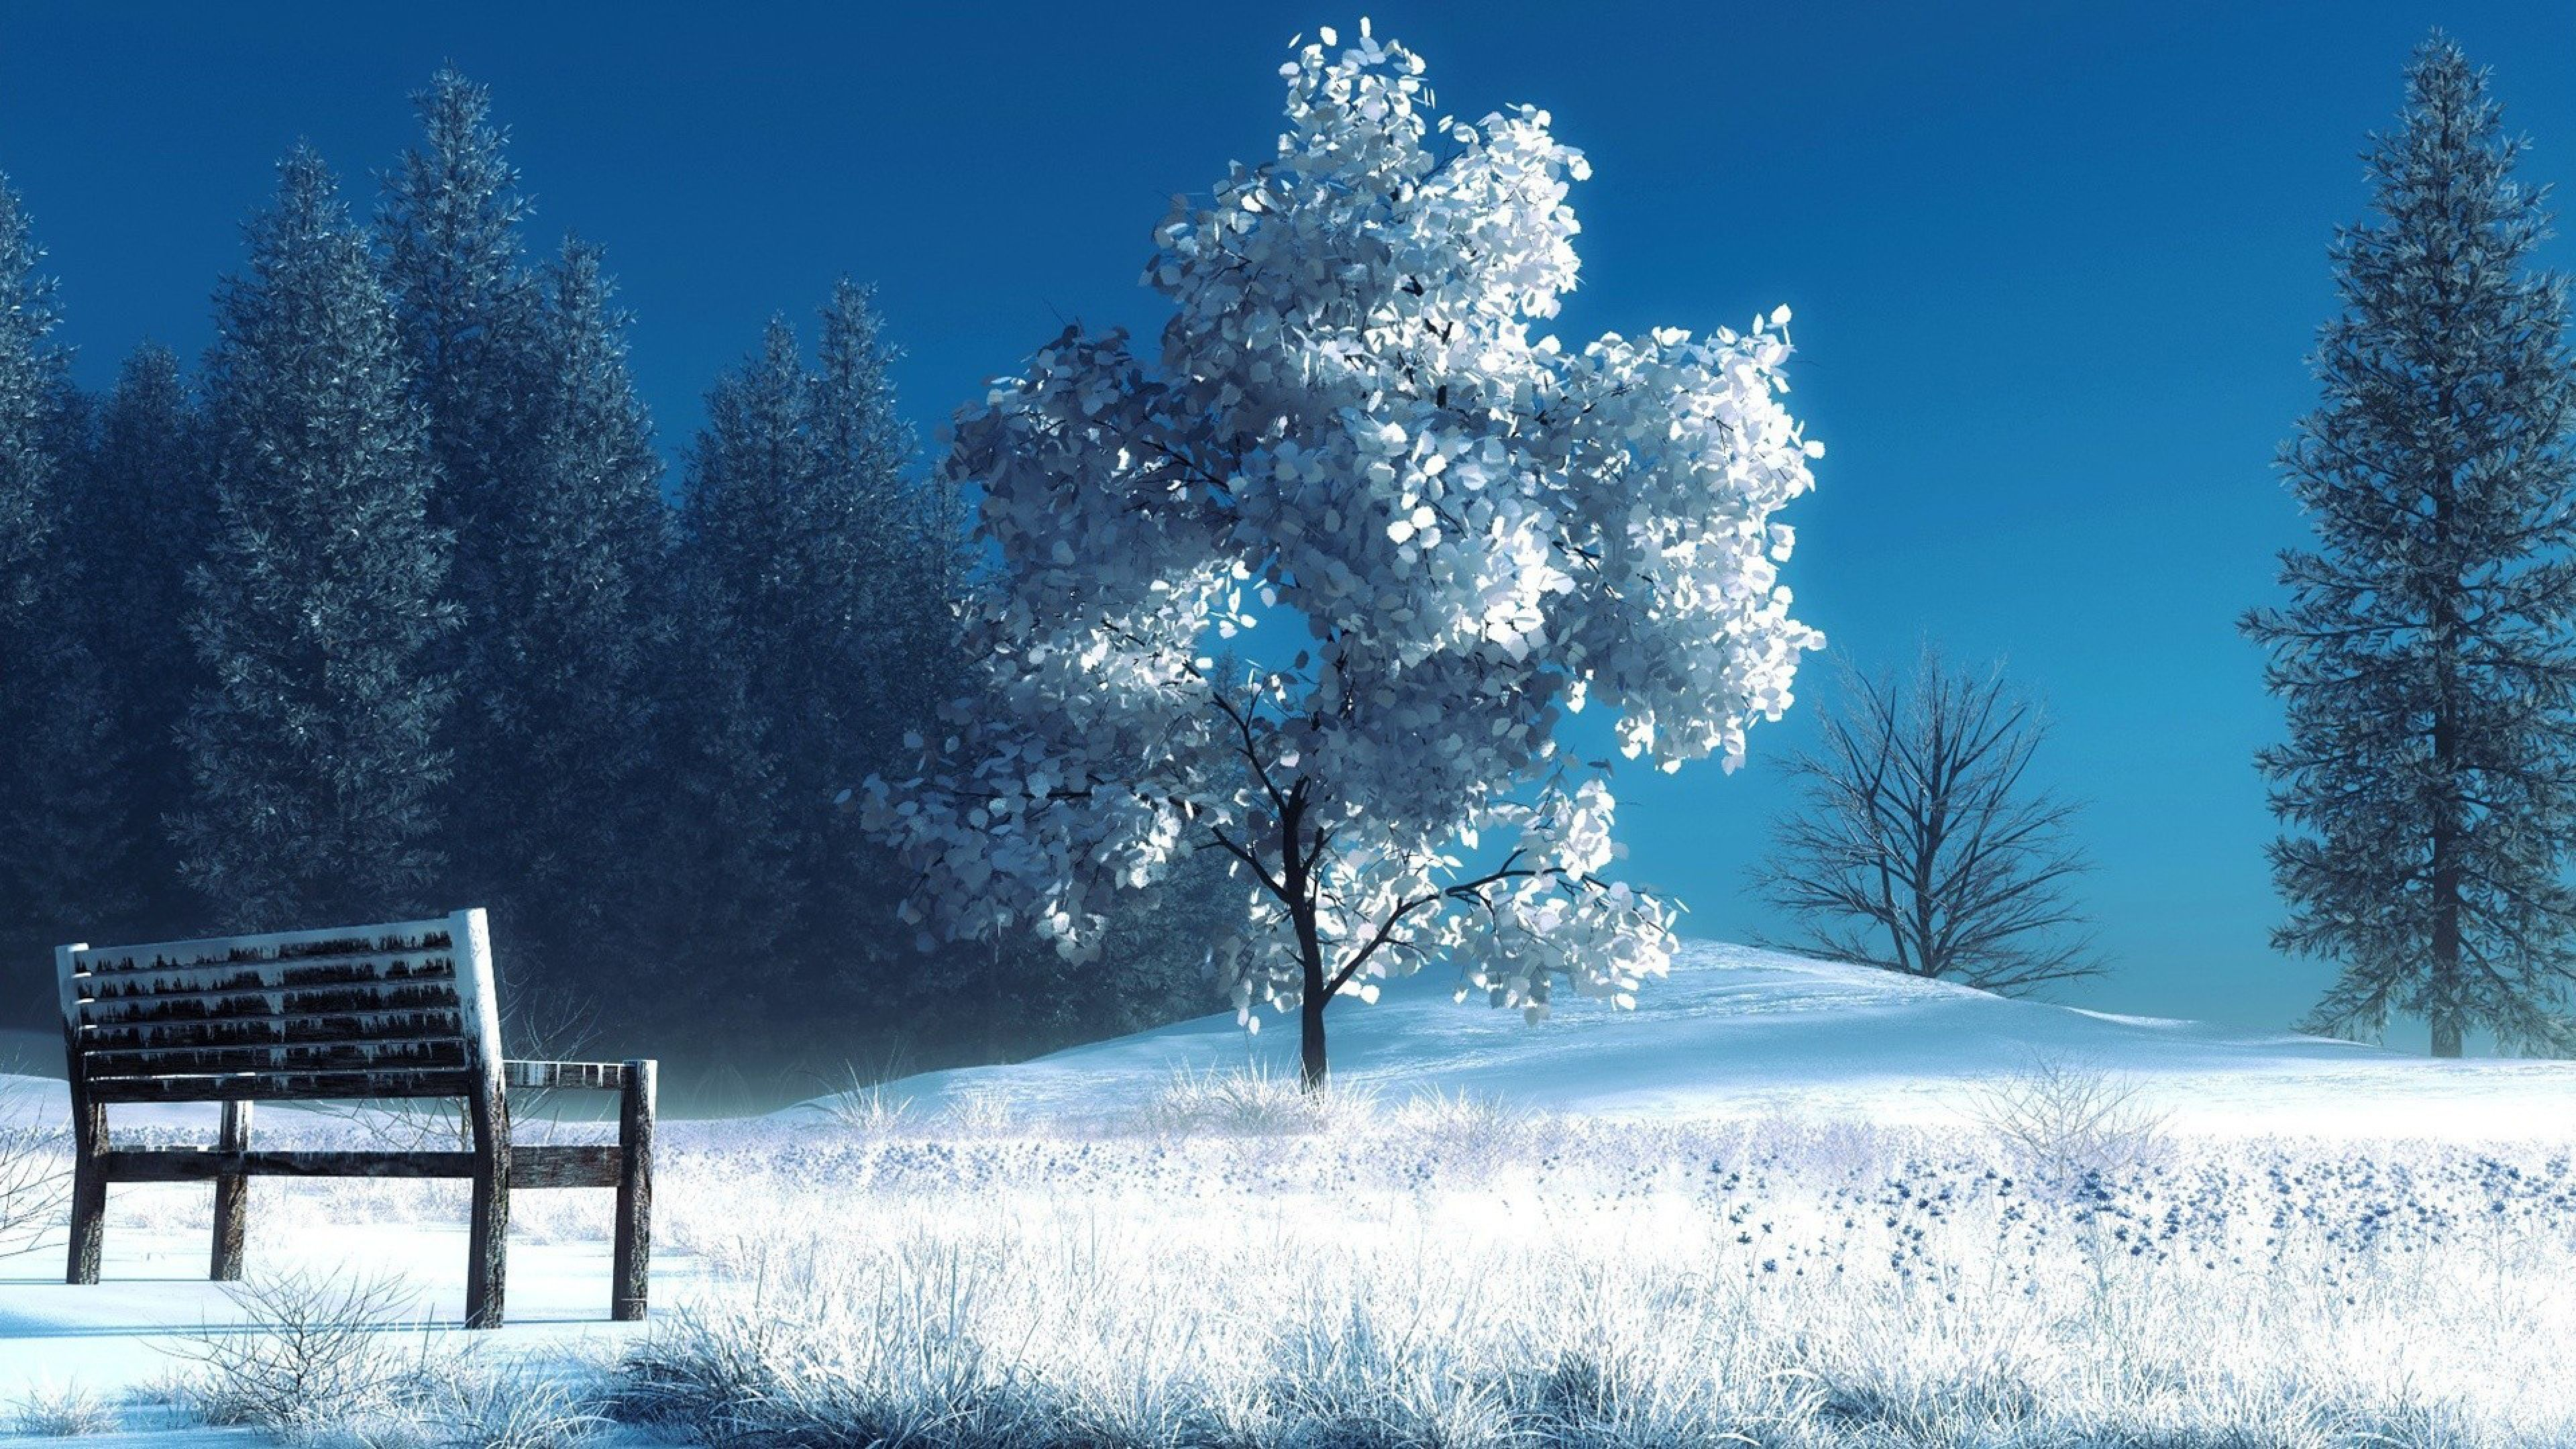 3840x2160 Wallpaper Winter Landscape Nature Snow Bench